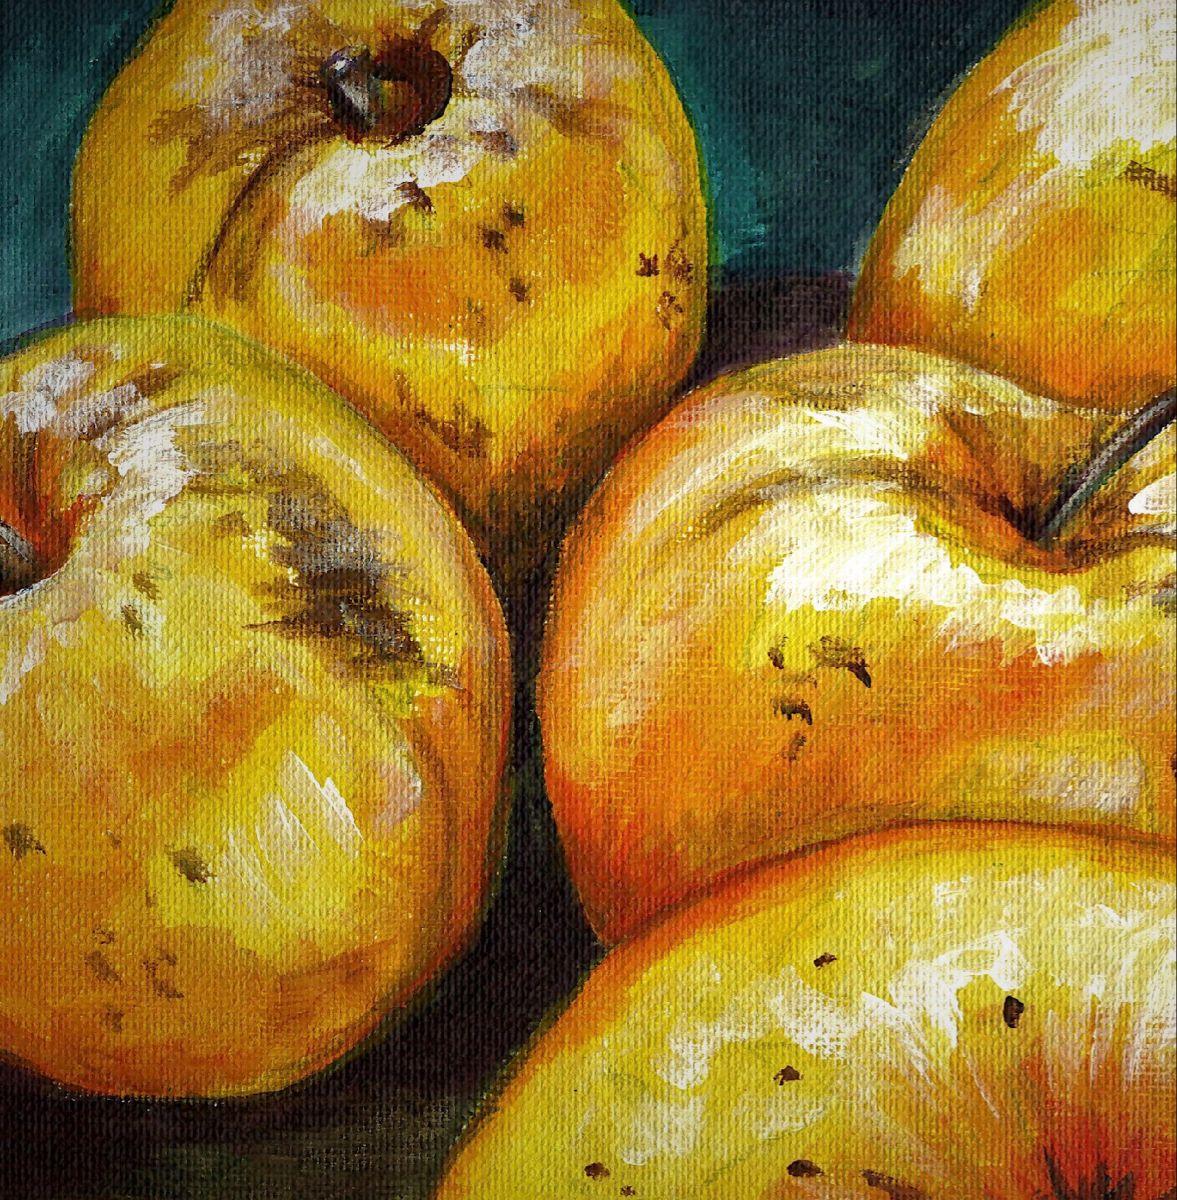 #painting #acrylicpainting #stilllifepainting #apples #harvest #autumn #mabon #fall #fineart #cottagecore #cozycore #autumncozy #supportlivingartists #supportsmallbusiness #salemoregonartist #whatpennymade